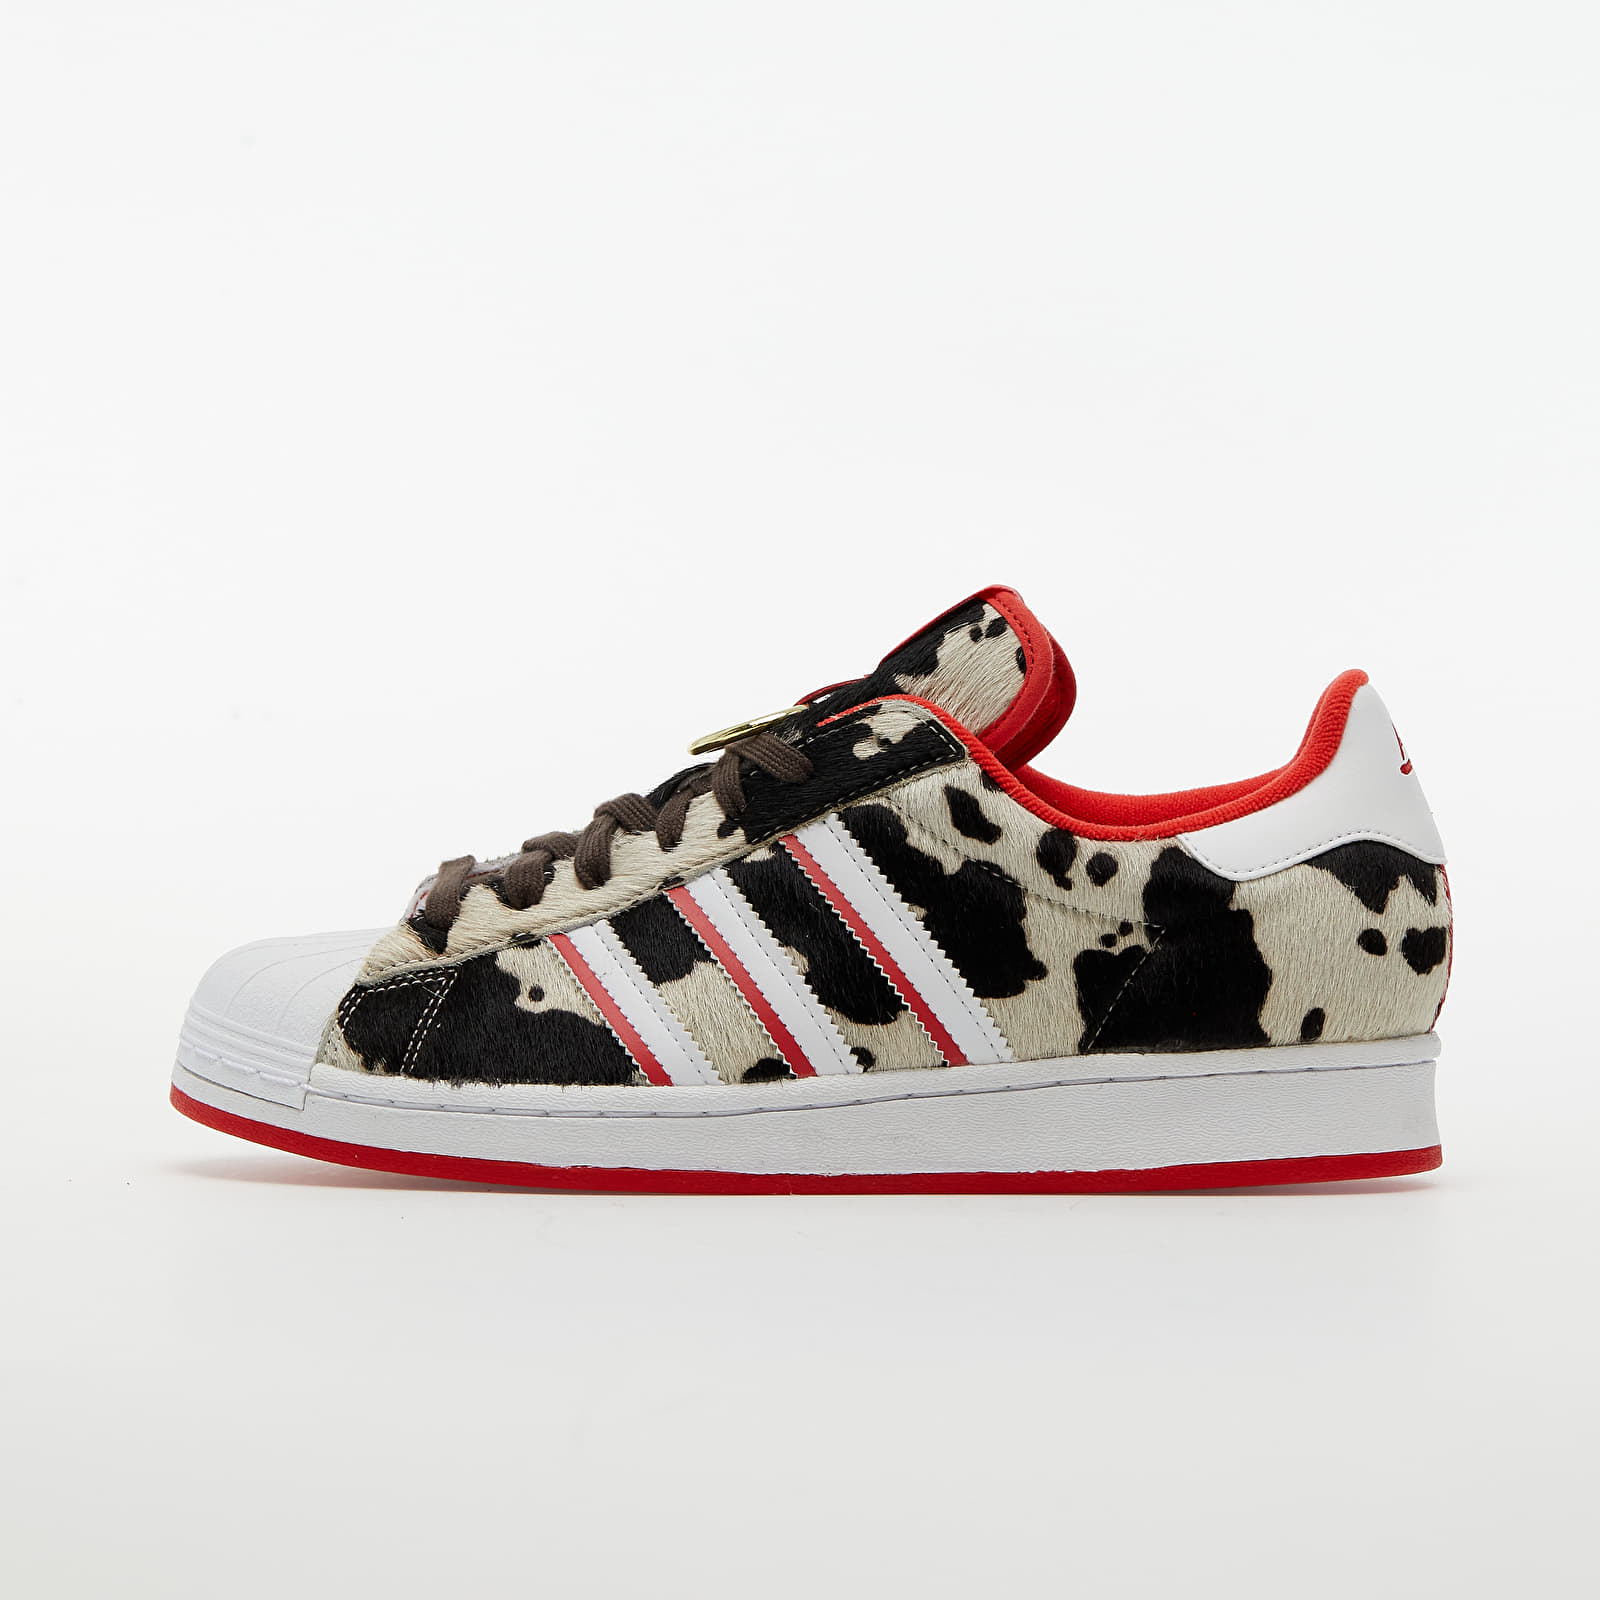 adidas Superstar Ftwr White/ Lush Red/ Off White EUR 42